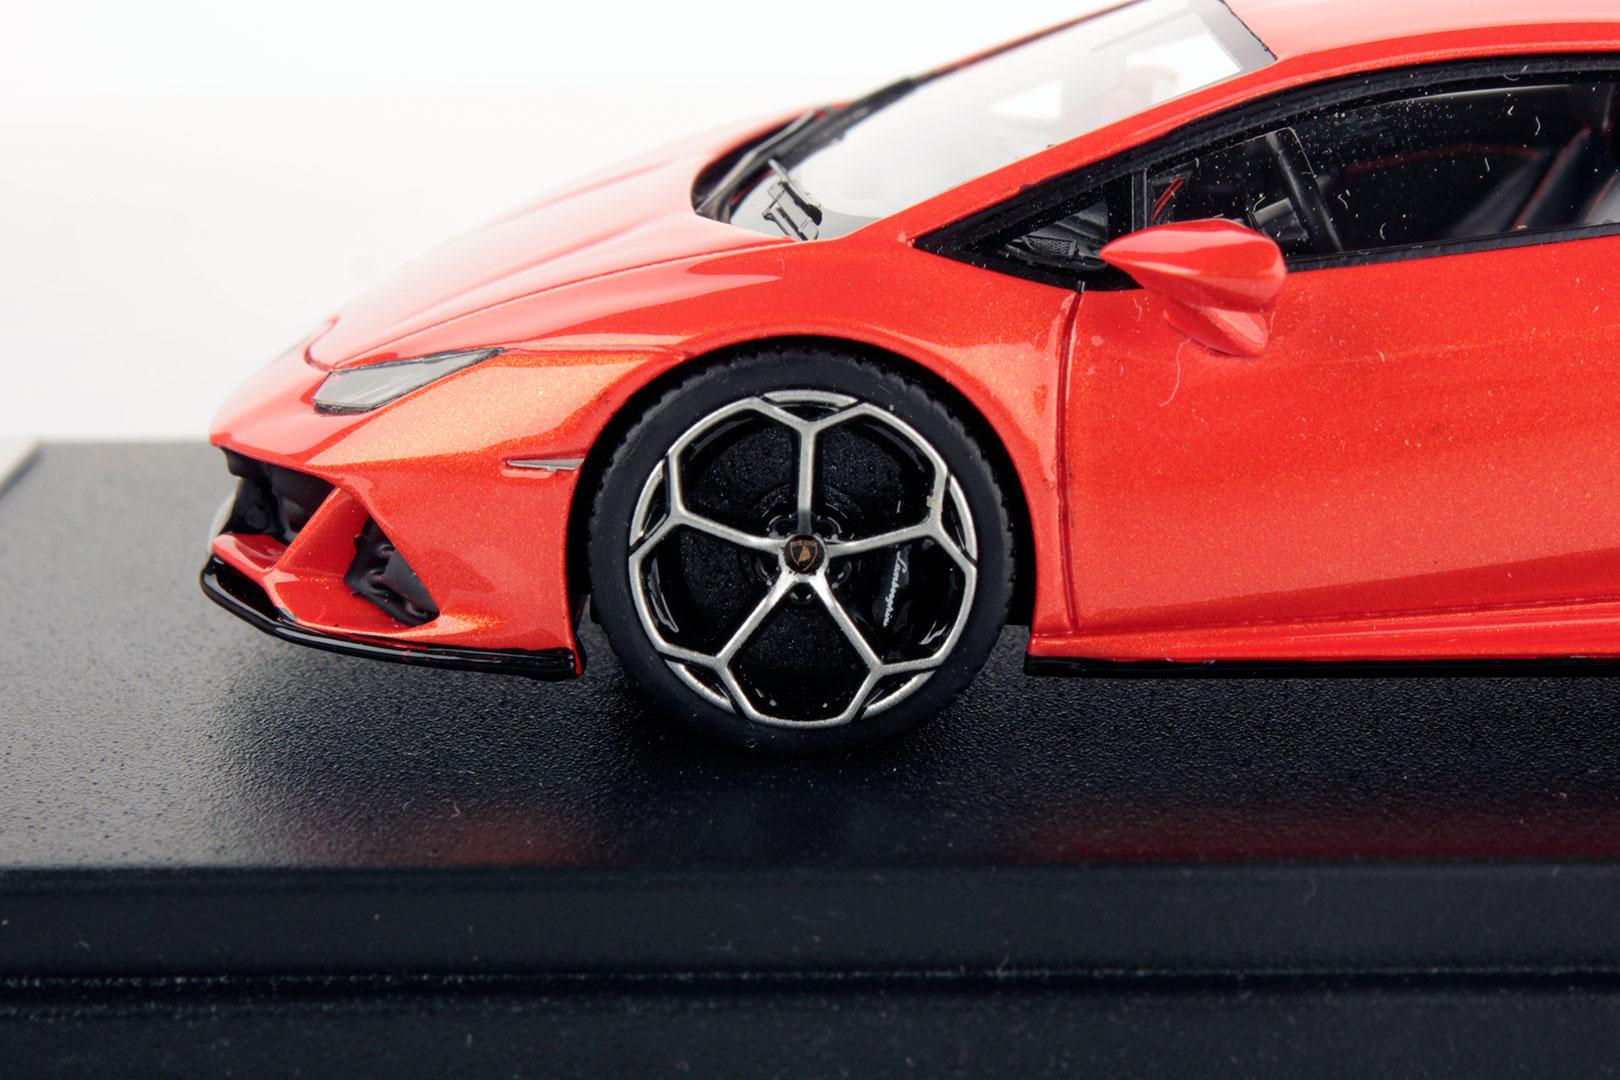 Lamborghini Huracan Evo miniature (8)